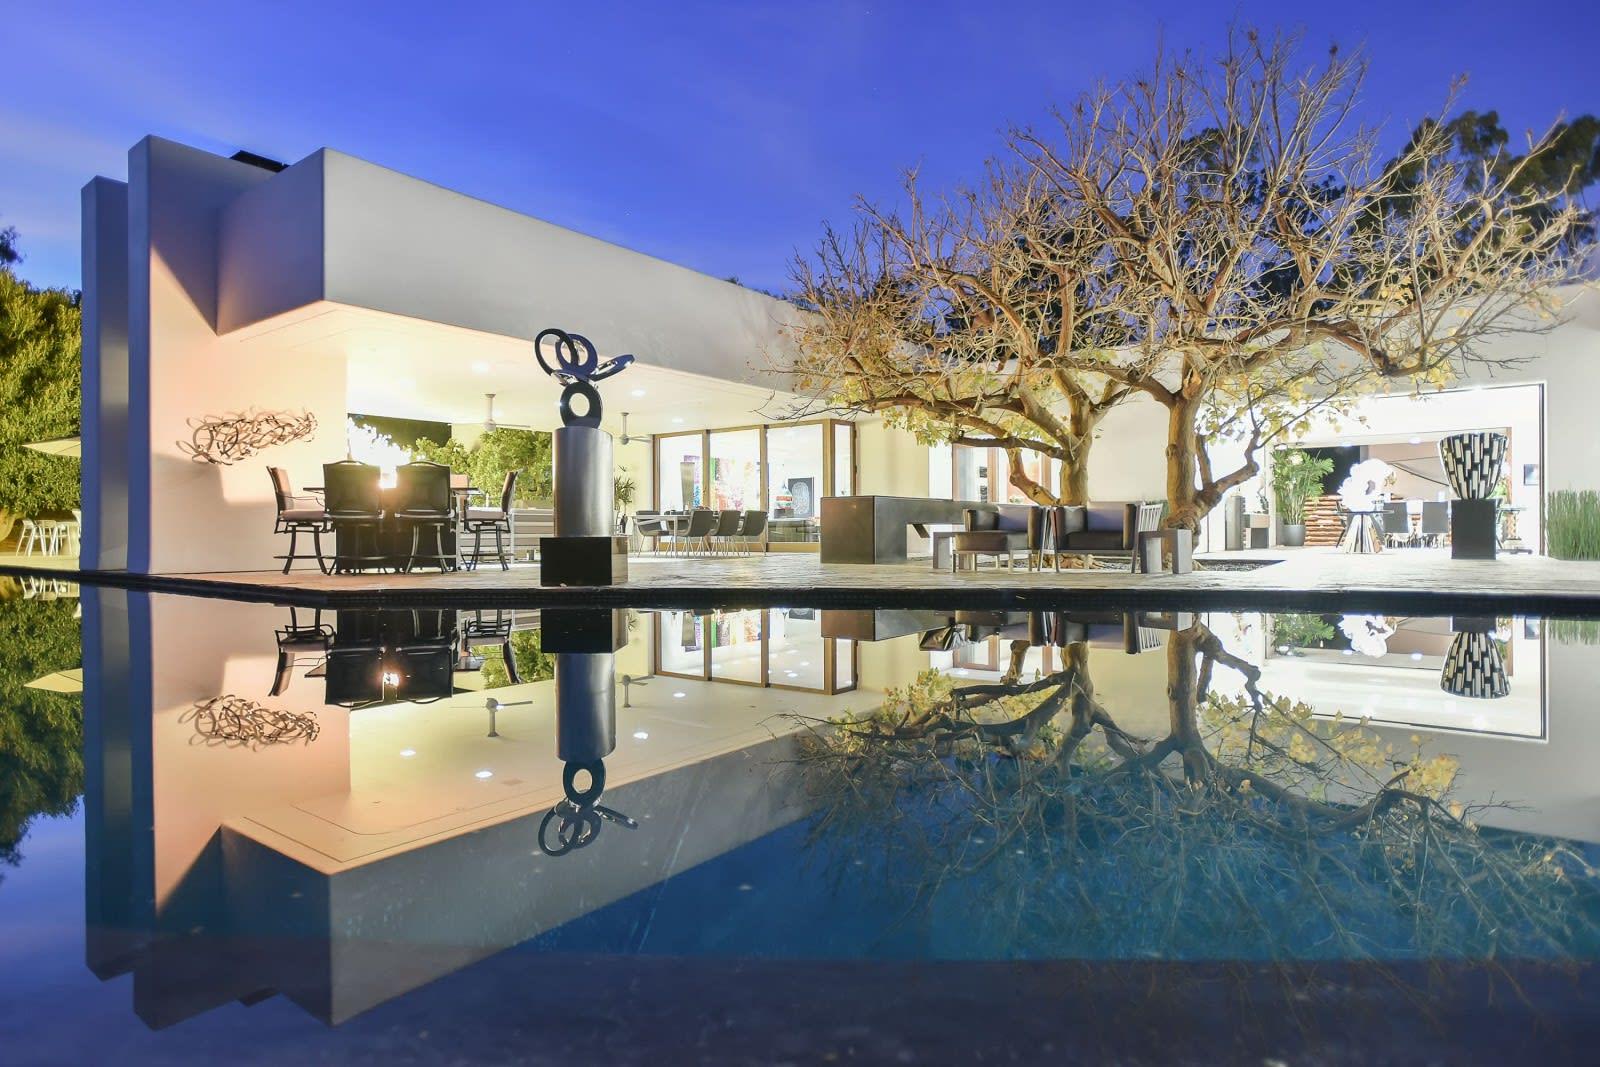 4 San Diego Design Trends Making the International Scene